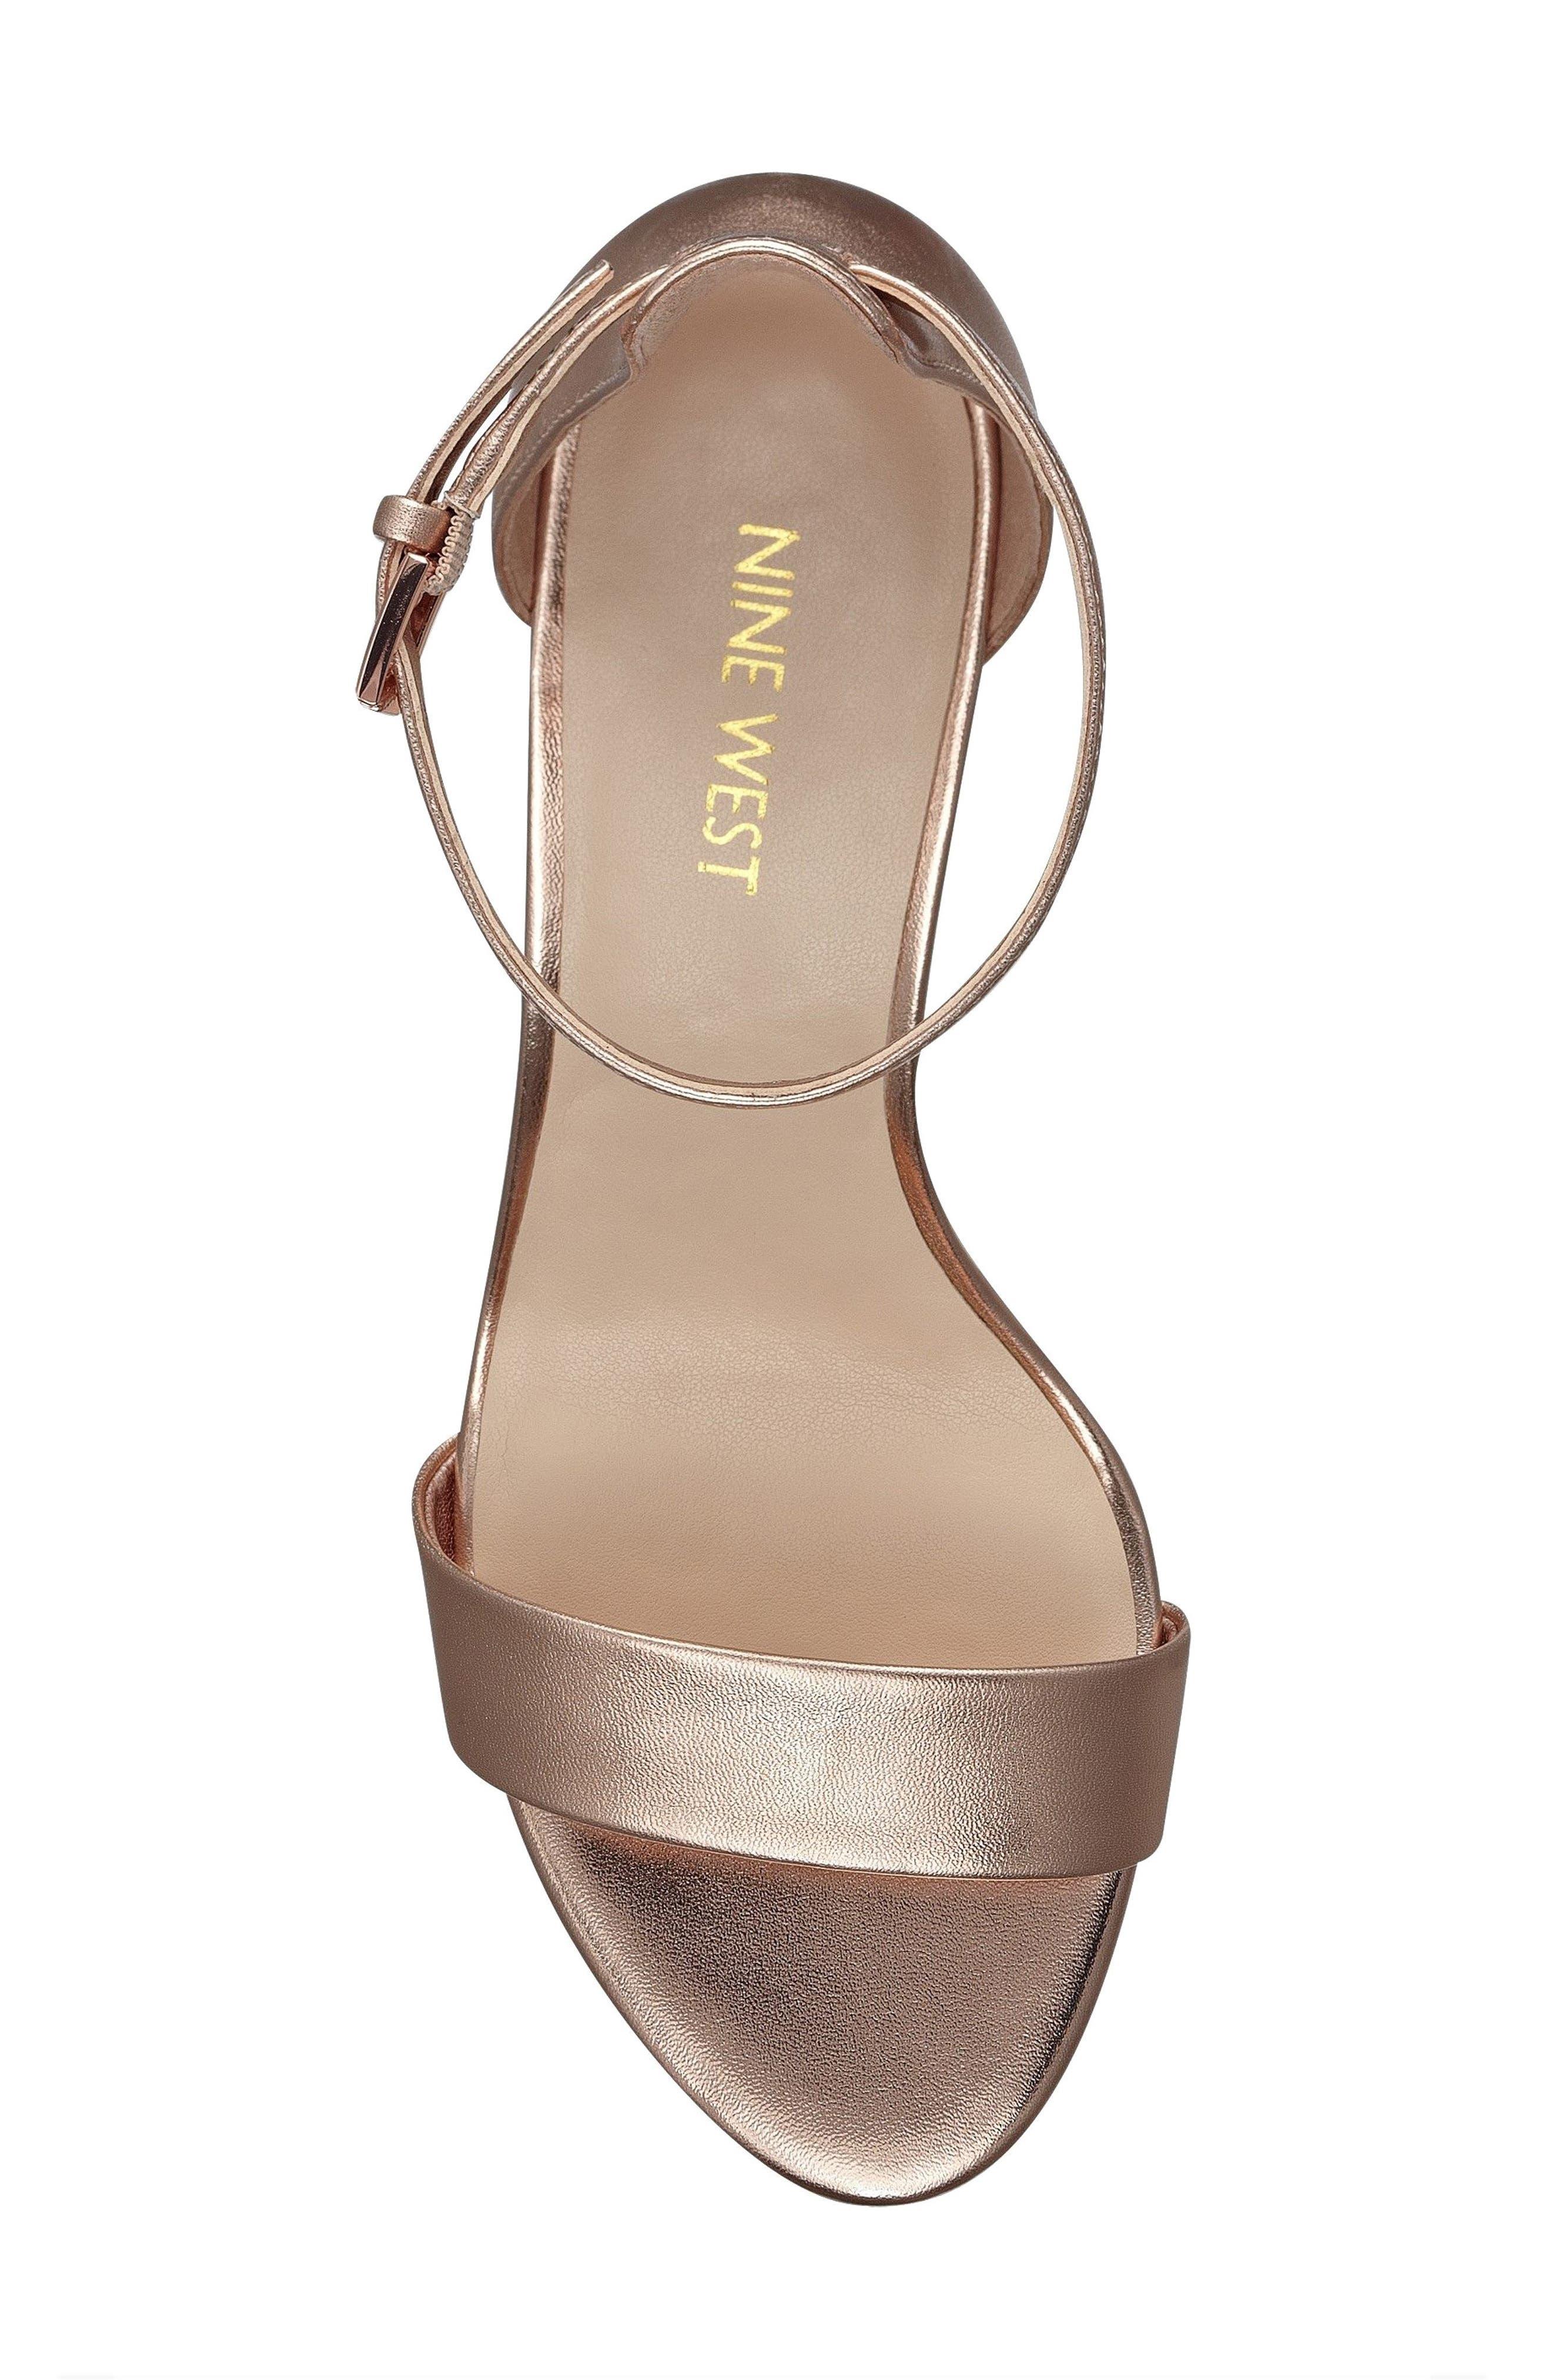 Pruce Ankle Strap Sandal,                             Alternate thumbnail 5, color,                             Matte Rose Gold